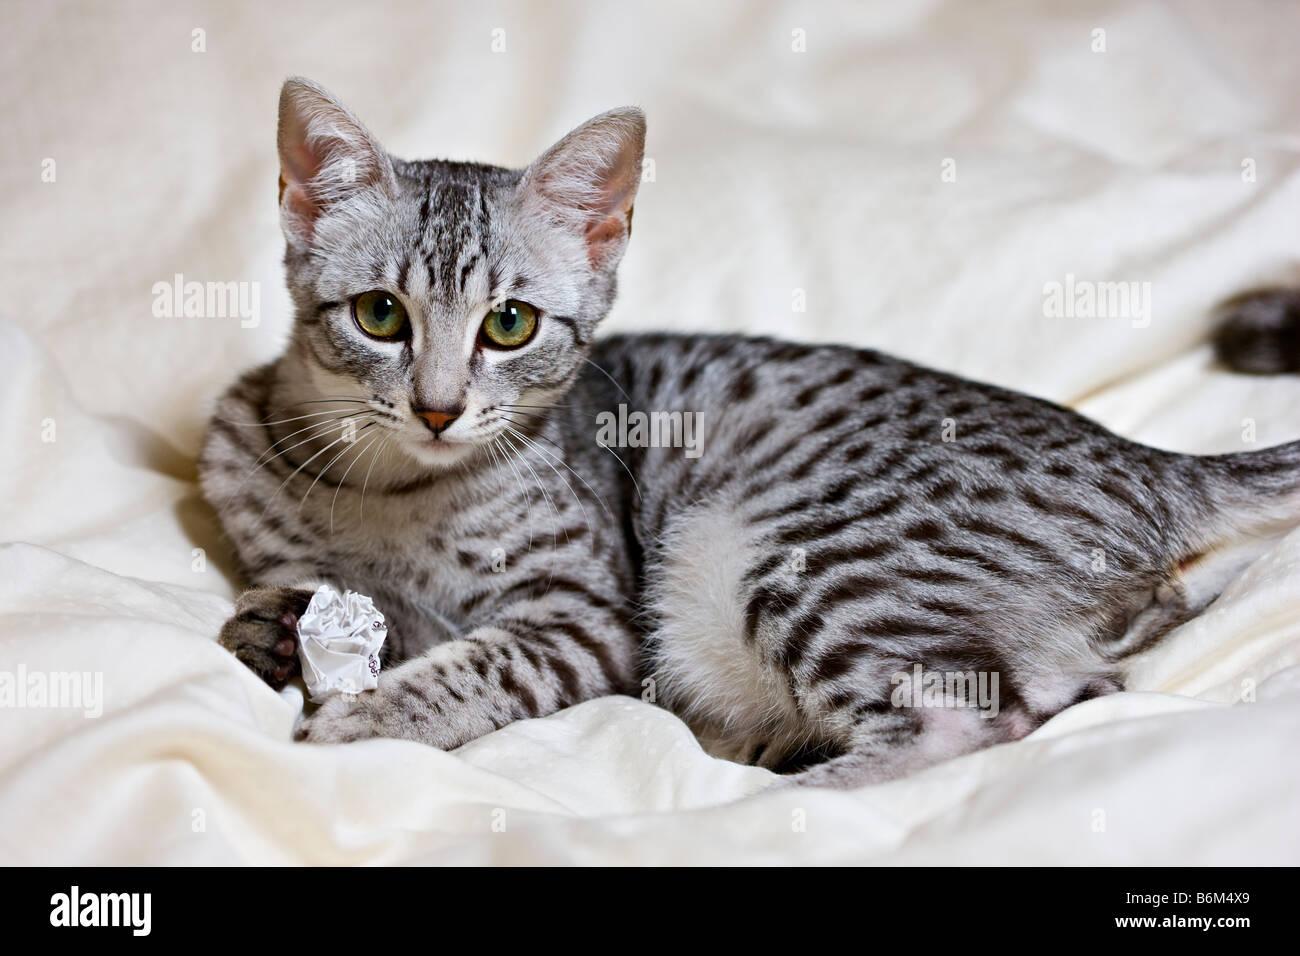 Egyptian Cats Stock Photos & Egyptian Cats Stock Images - Alamy